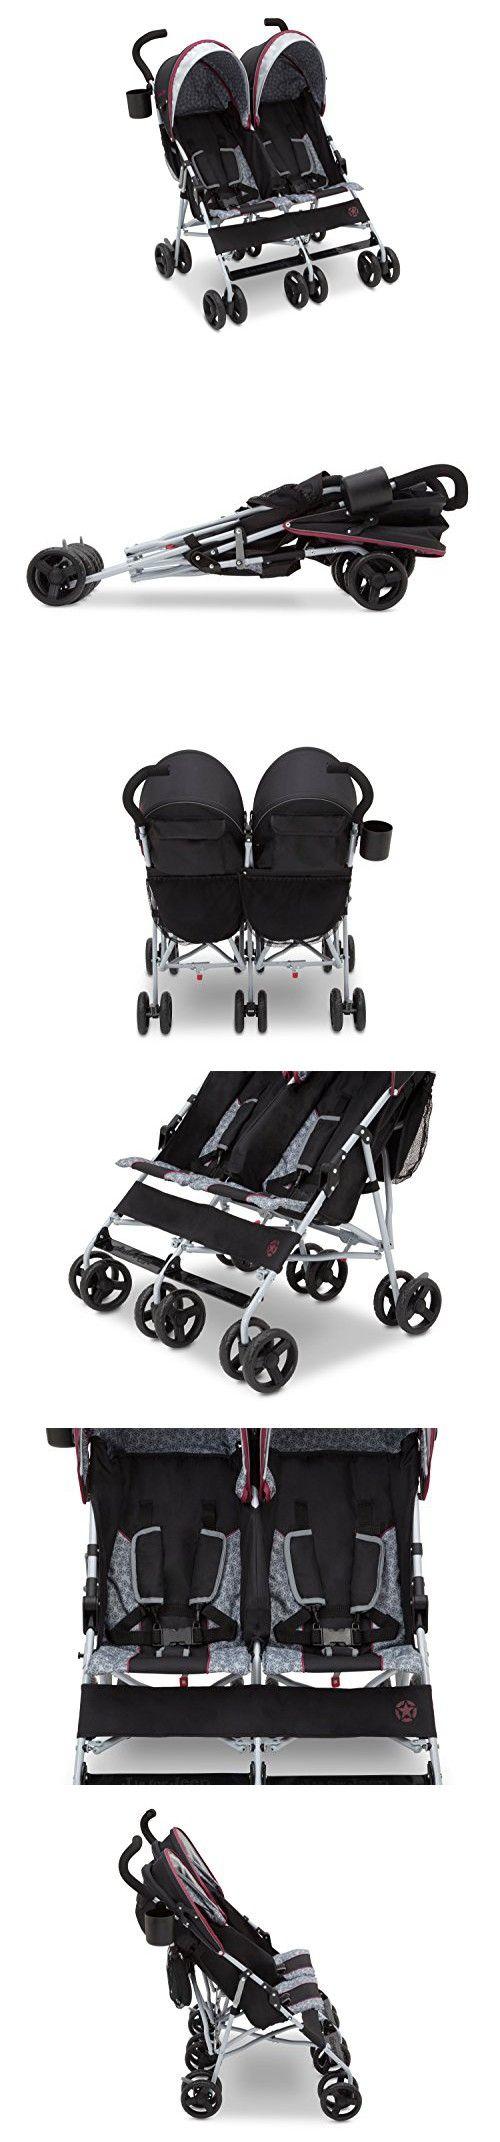 Best 25+ Baby stroller brands ideas on Pinterest   Baby strollers ...